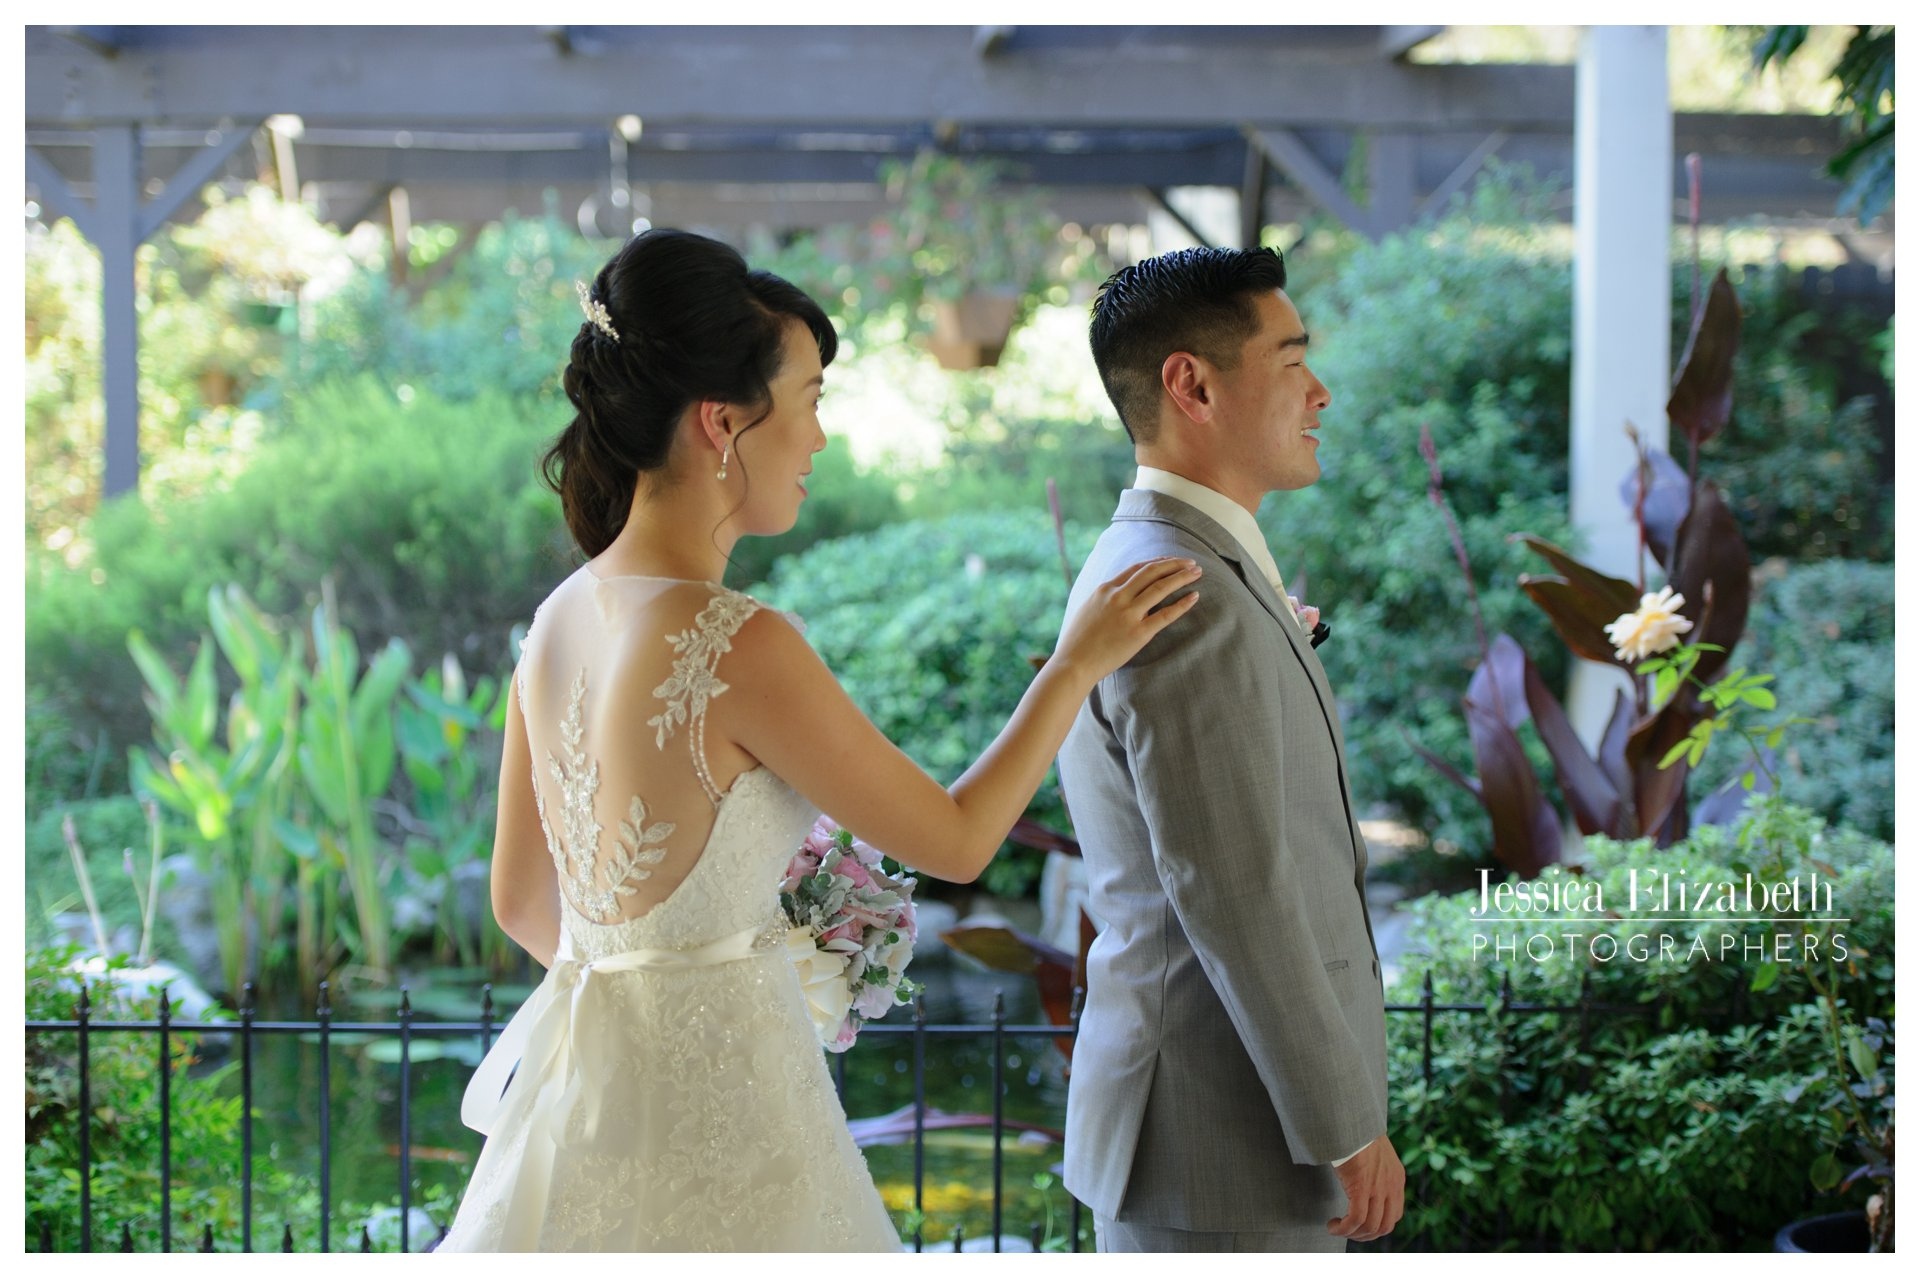 01 South Coast Botanic Garden Palos Verdes Wedding Photography By Jessica  Elizabeth ...